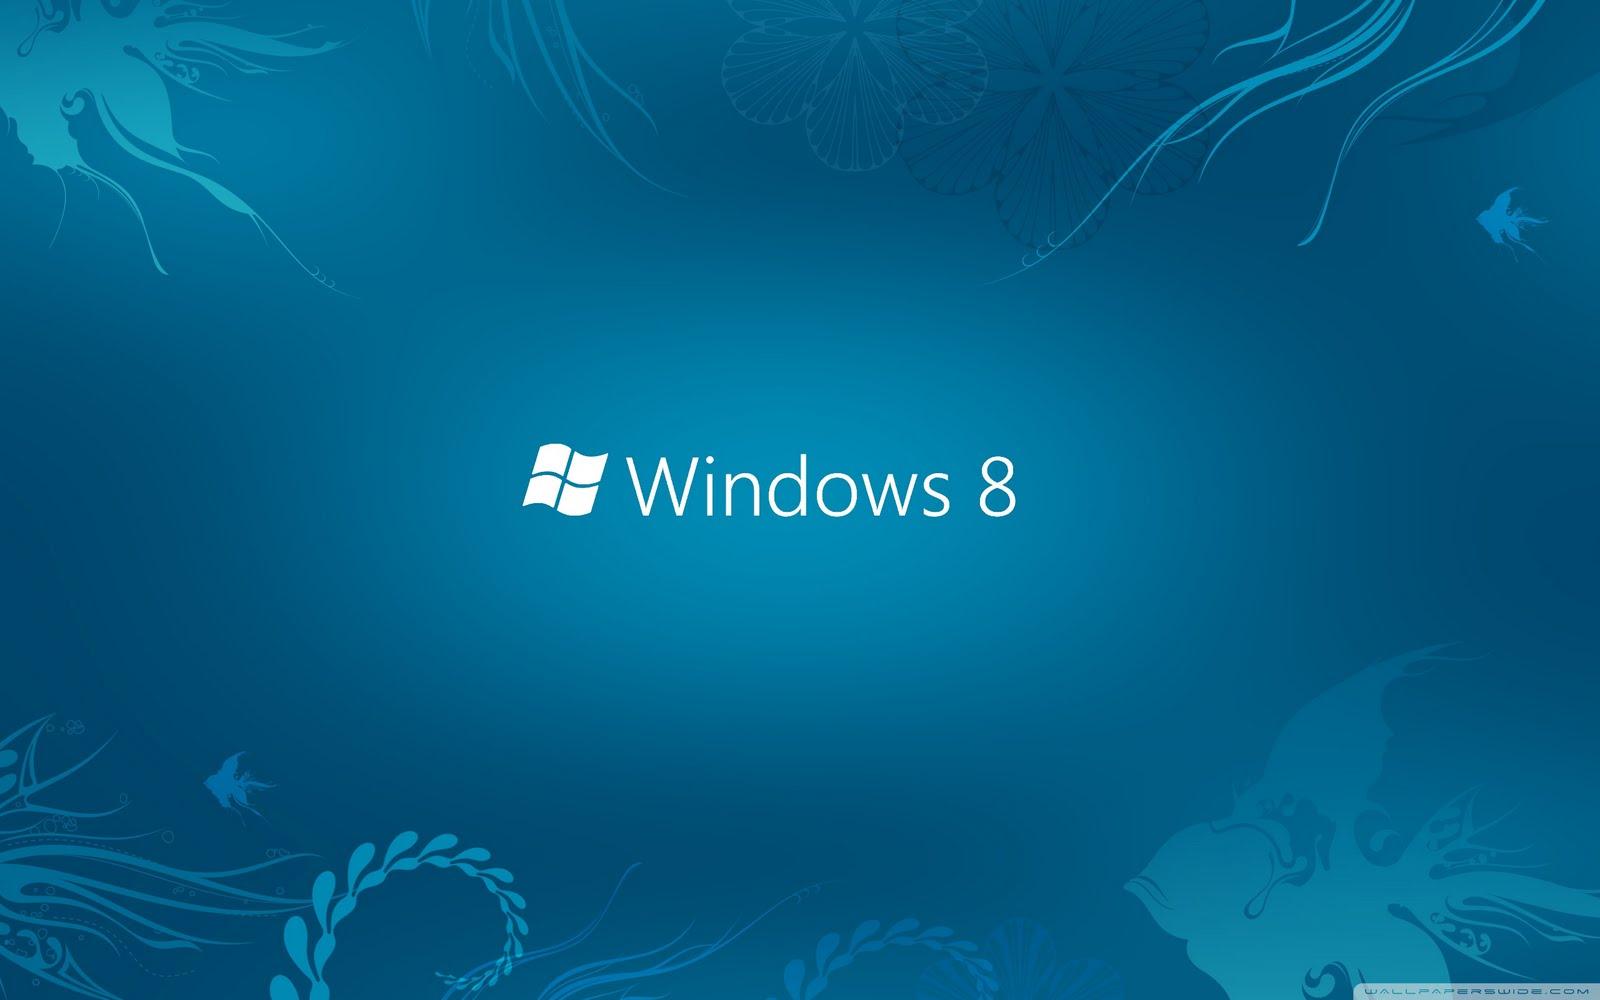 Top 12 Cool Windows 8 HD wallpapers for desktop backgrounds 8 1600x1000